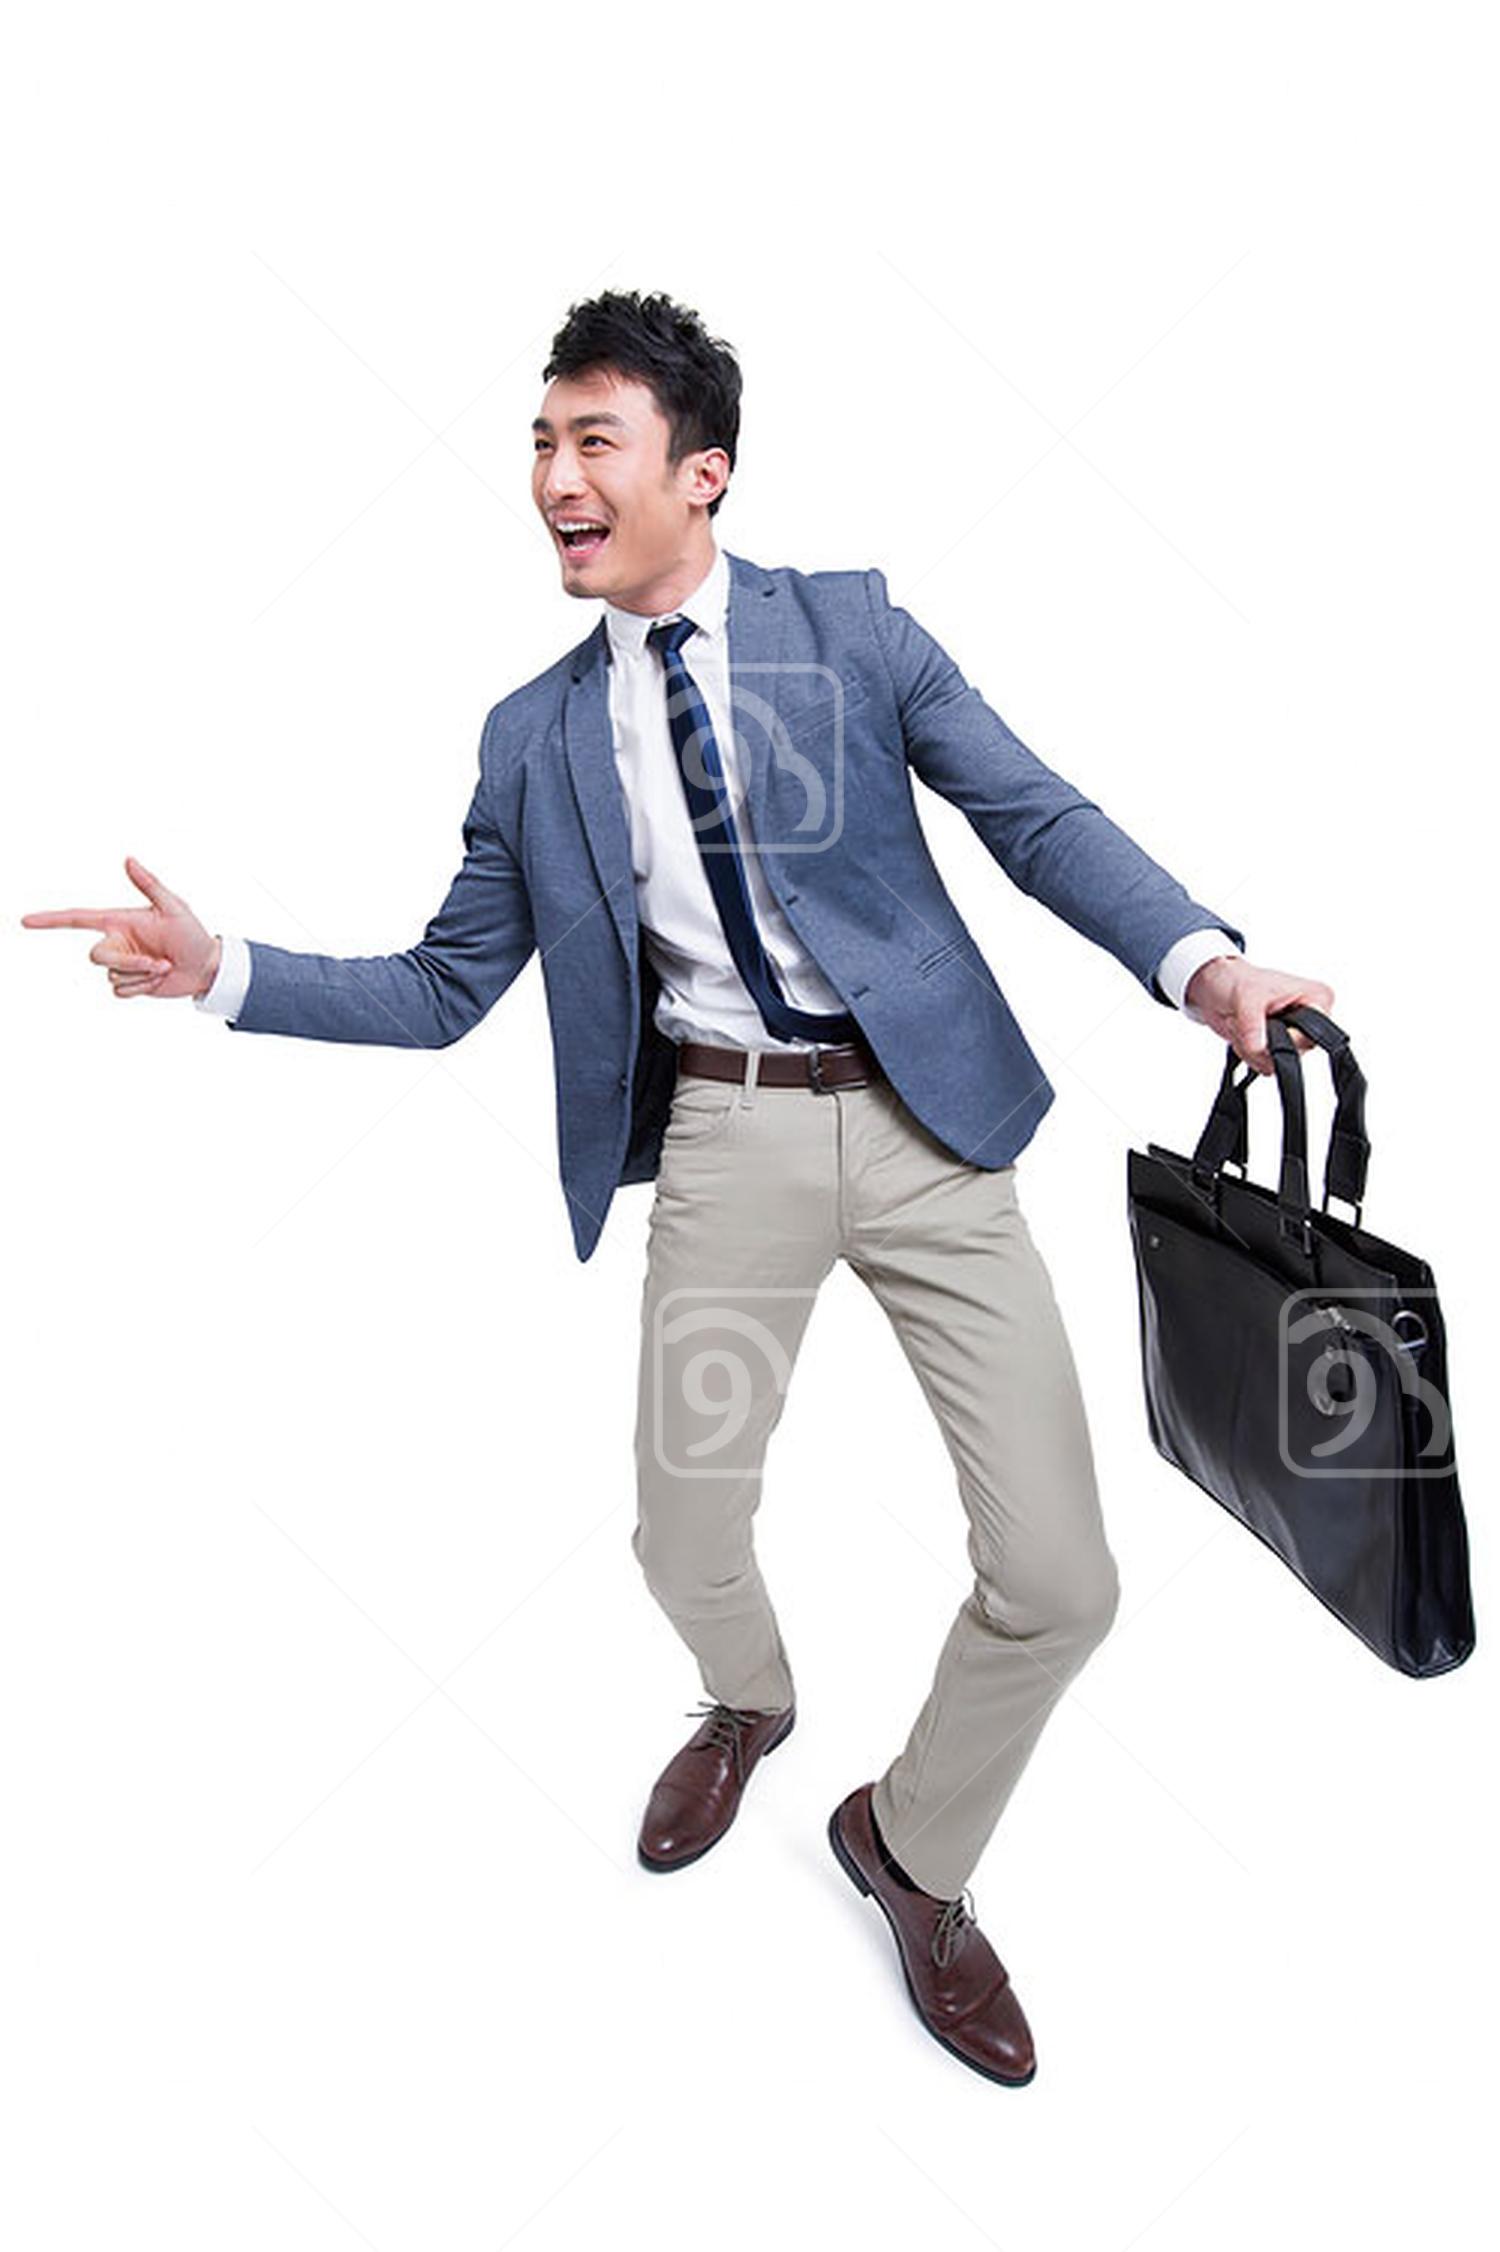 Cheerful Chinese businessman gesturing